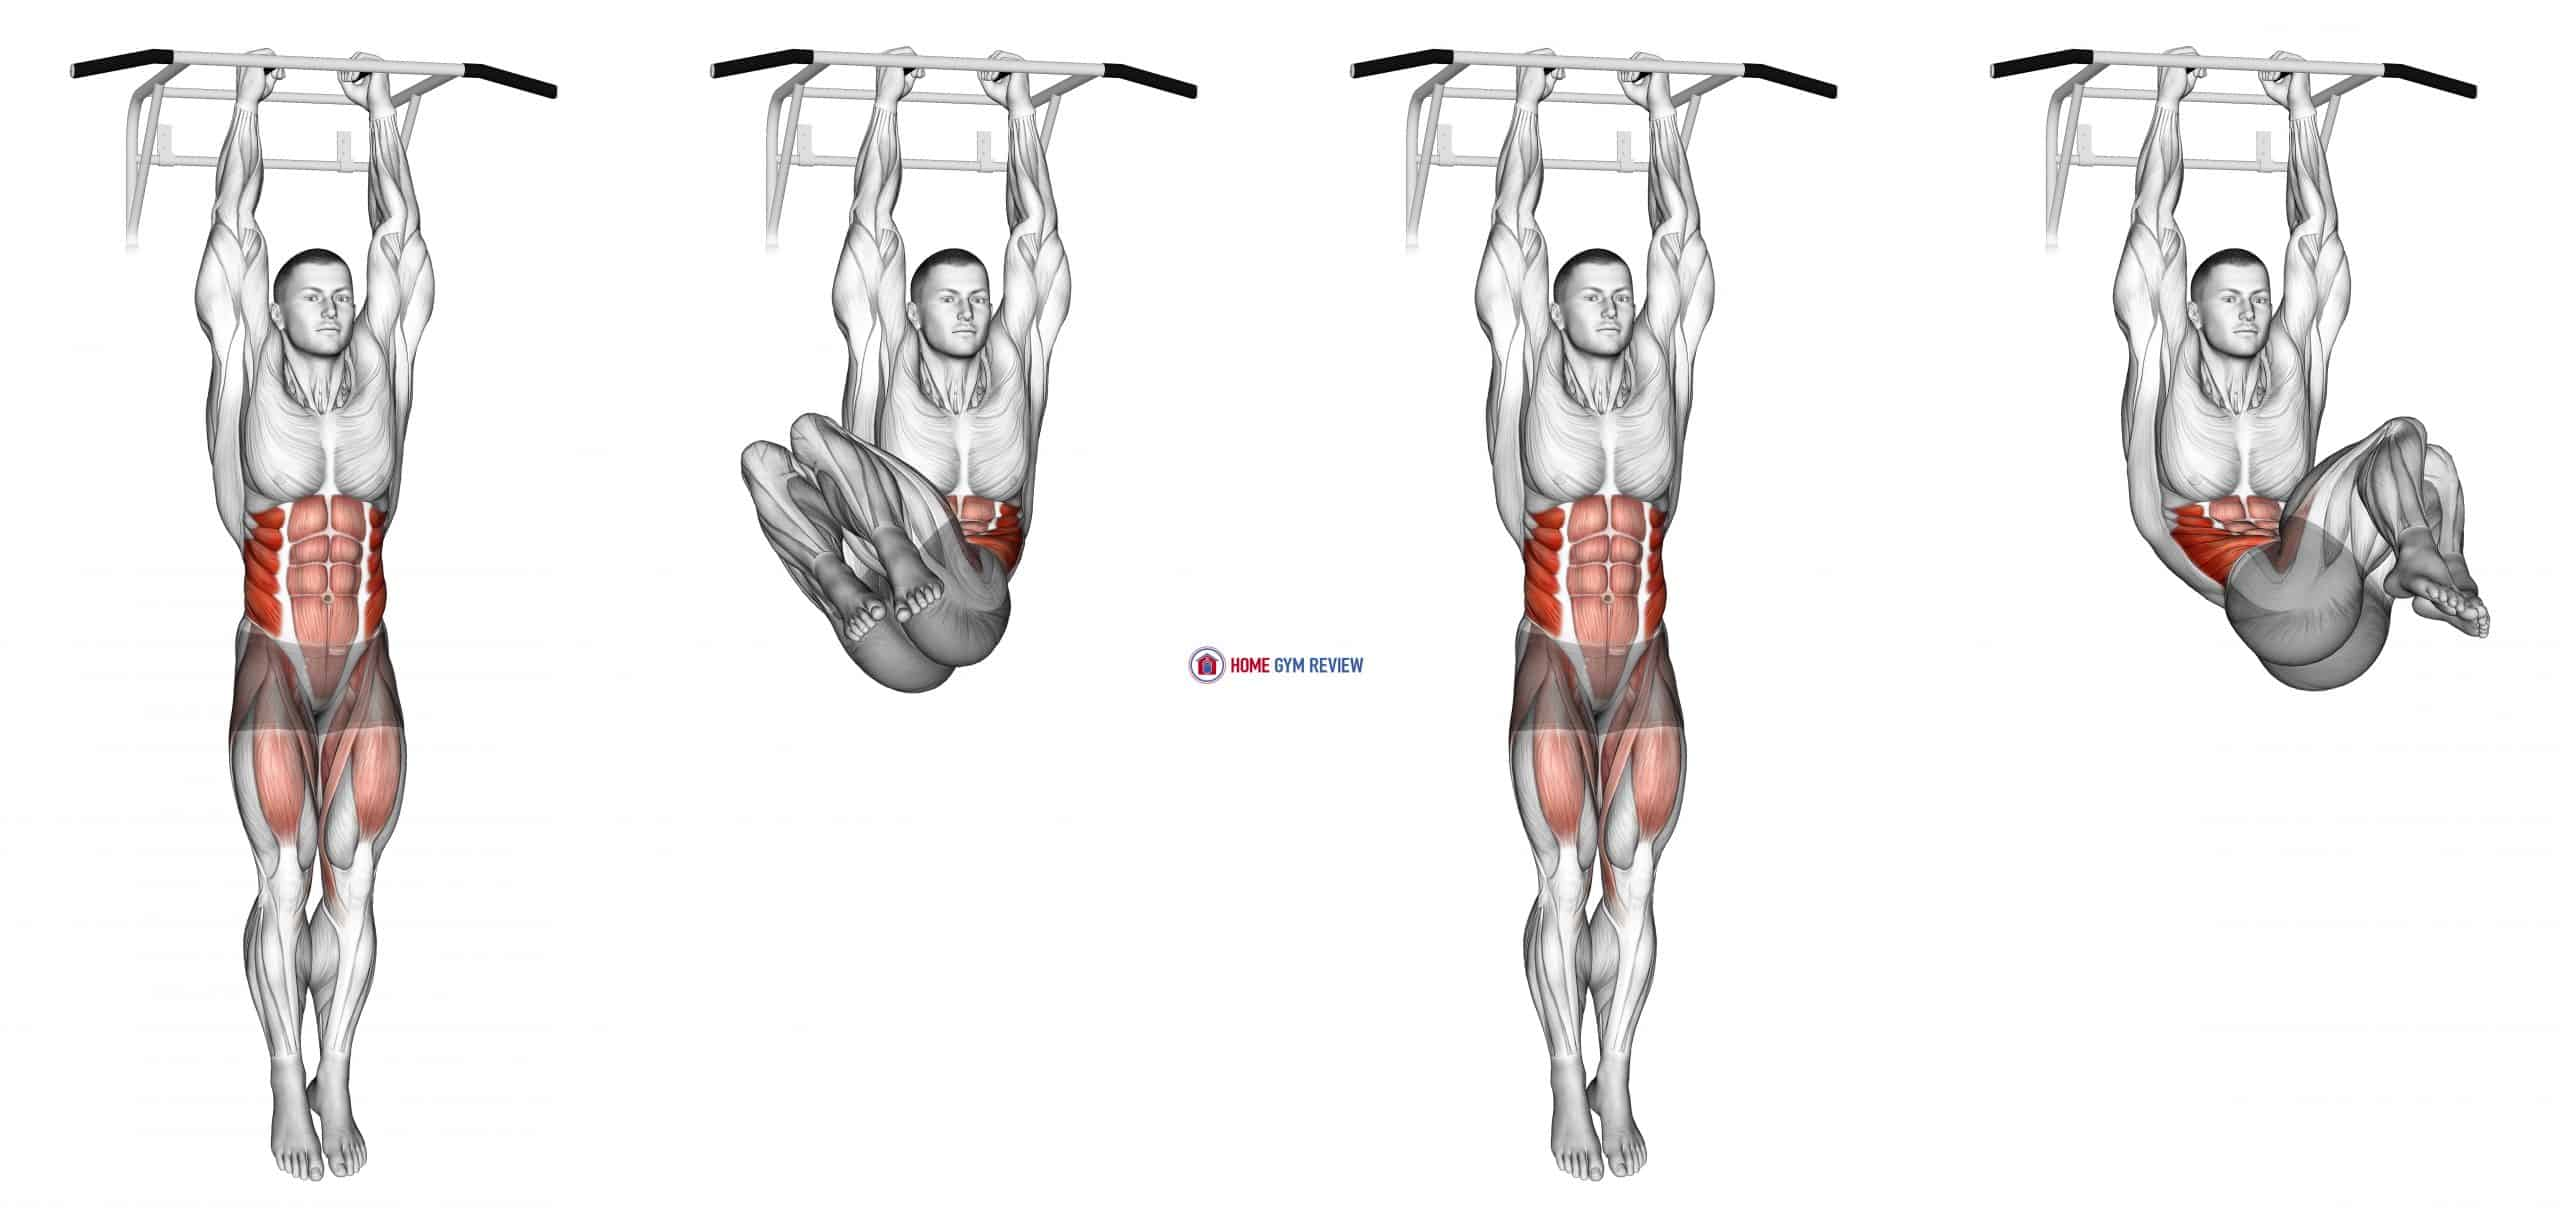 Hanging Oblique Knee Raise